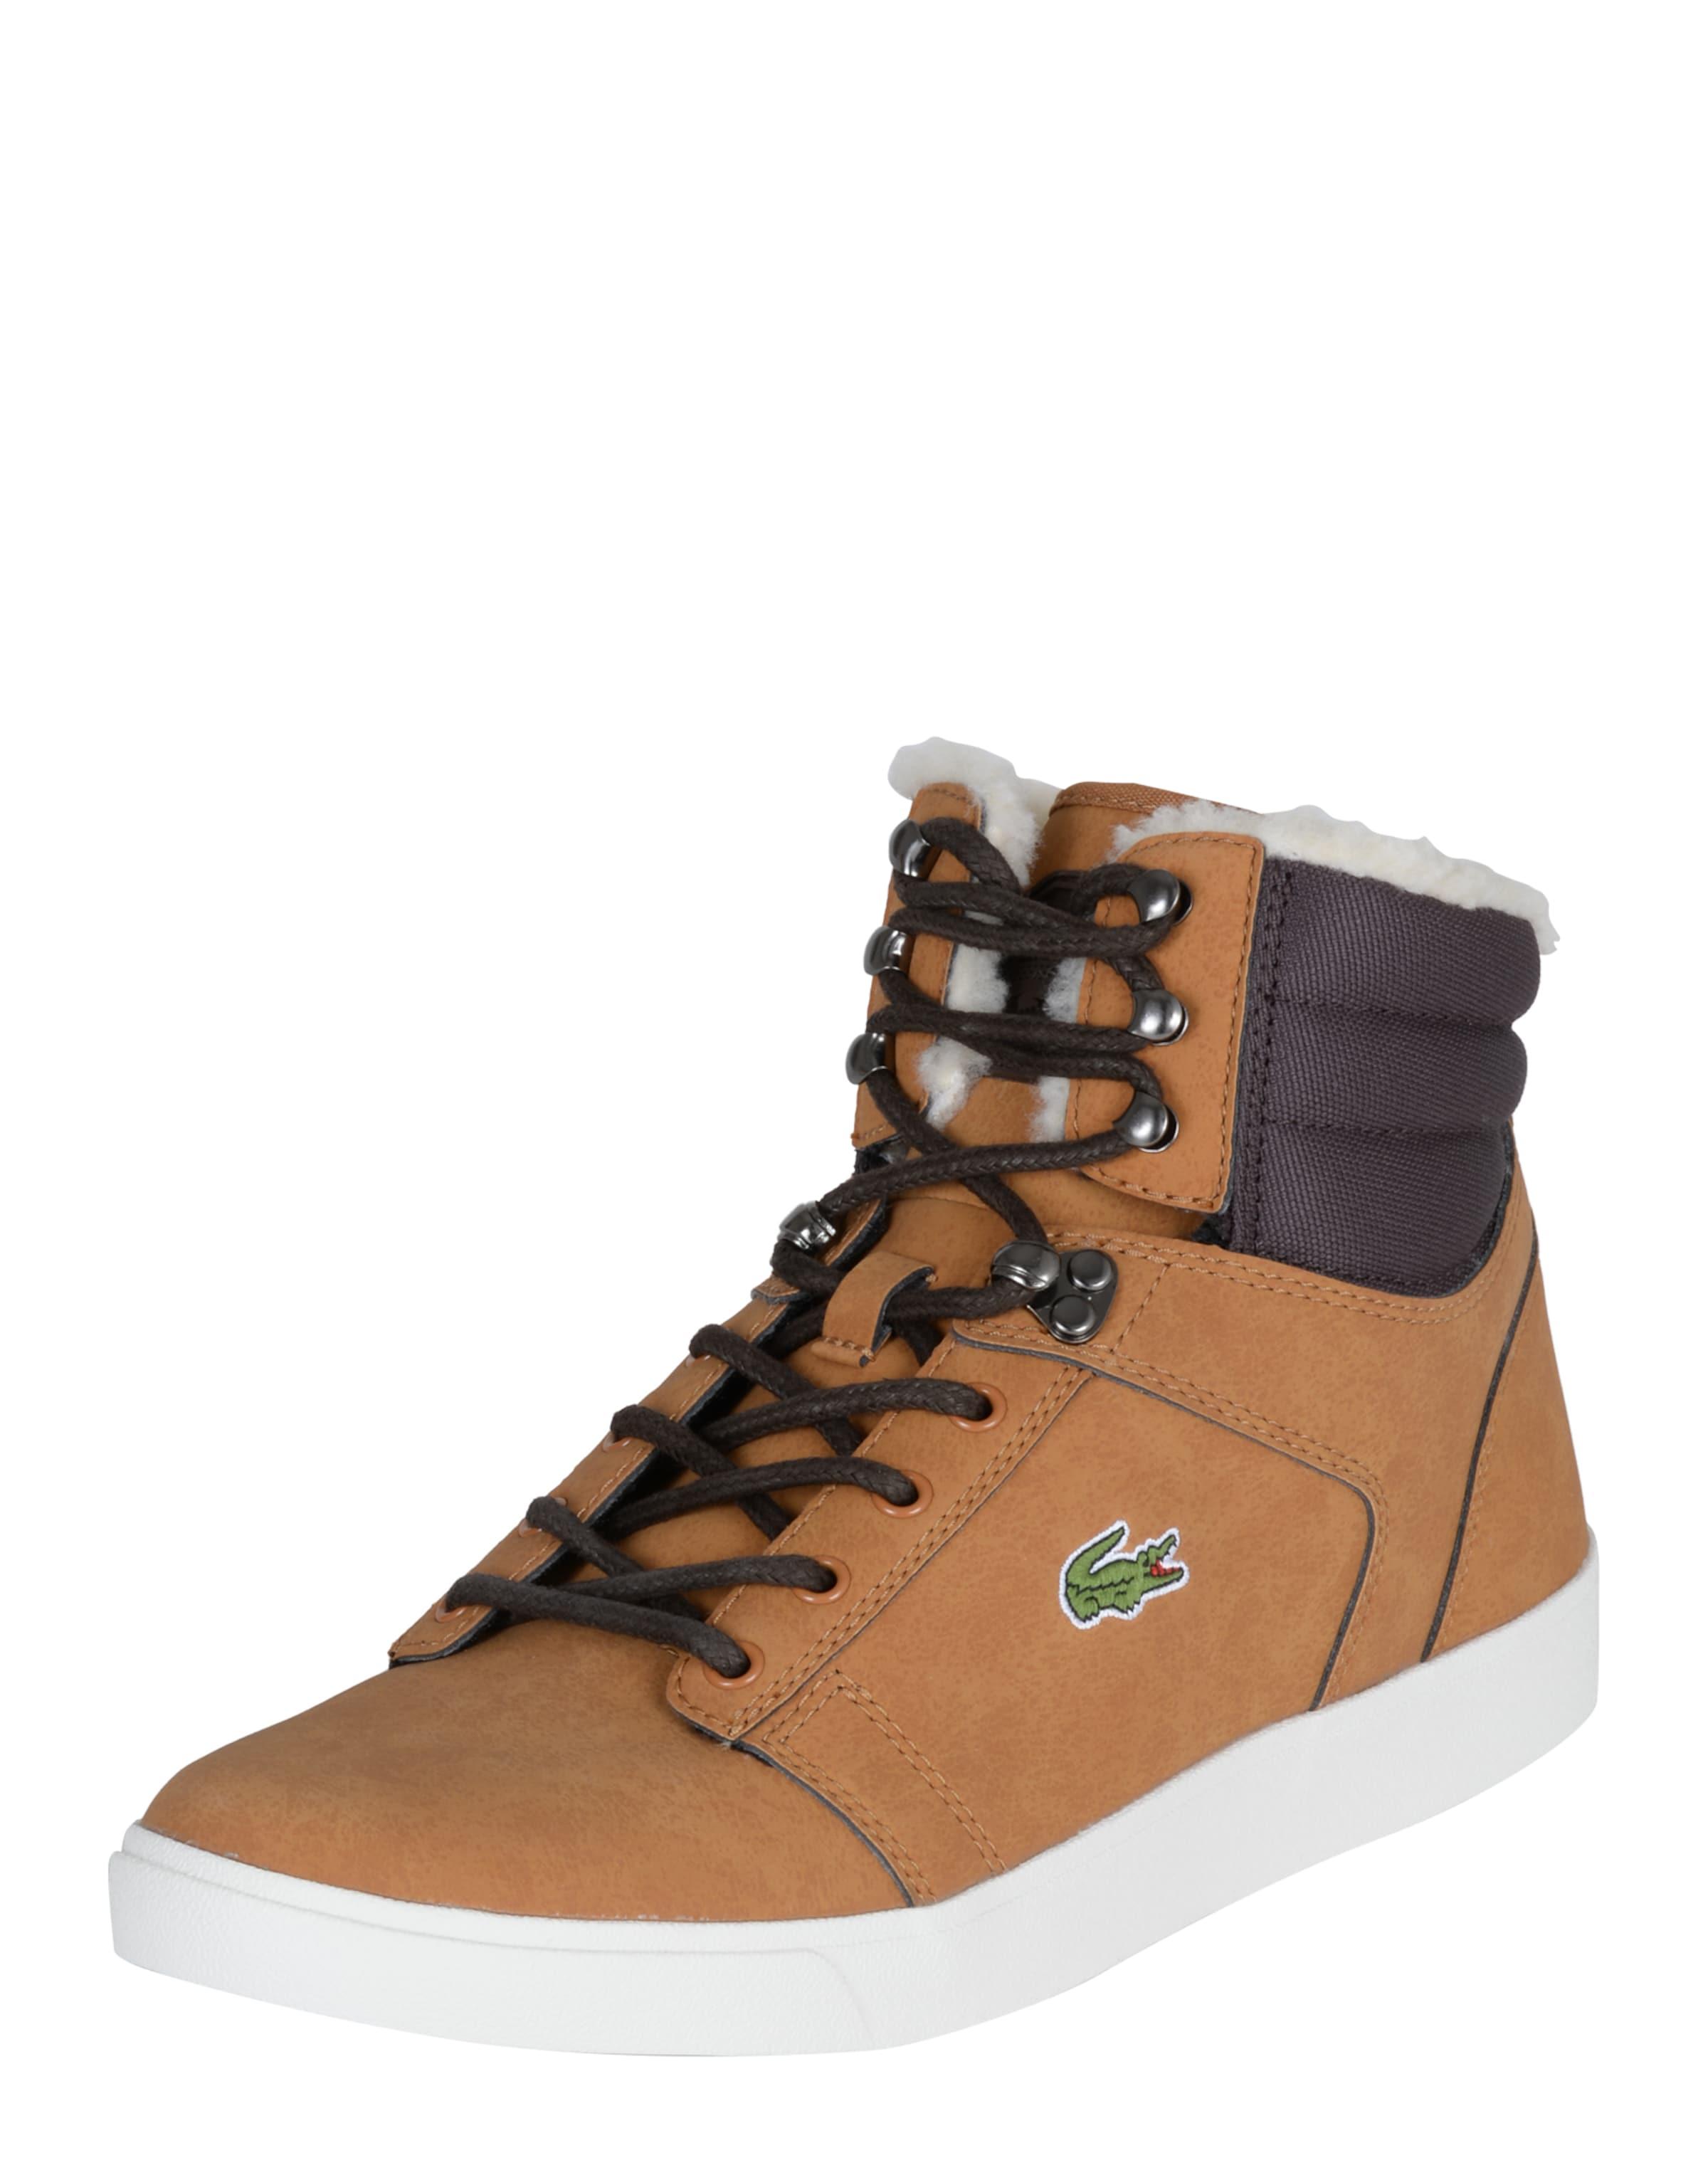 Haltbare Mode billige Schuhe LACOSTE | Sneaker 'Orelle' Schuhe Gut getragene Schuhe